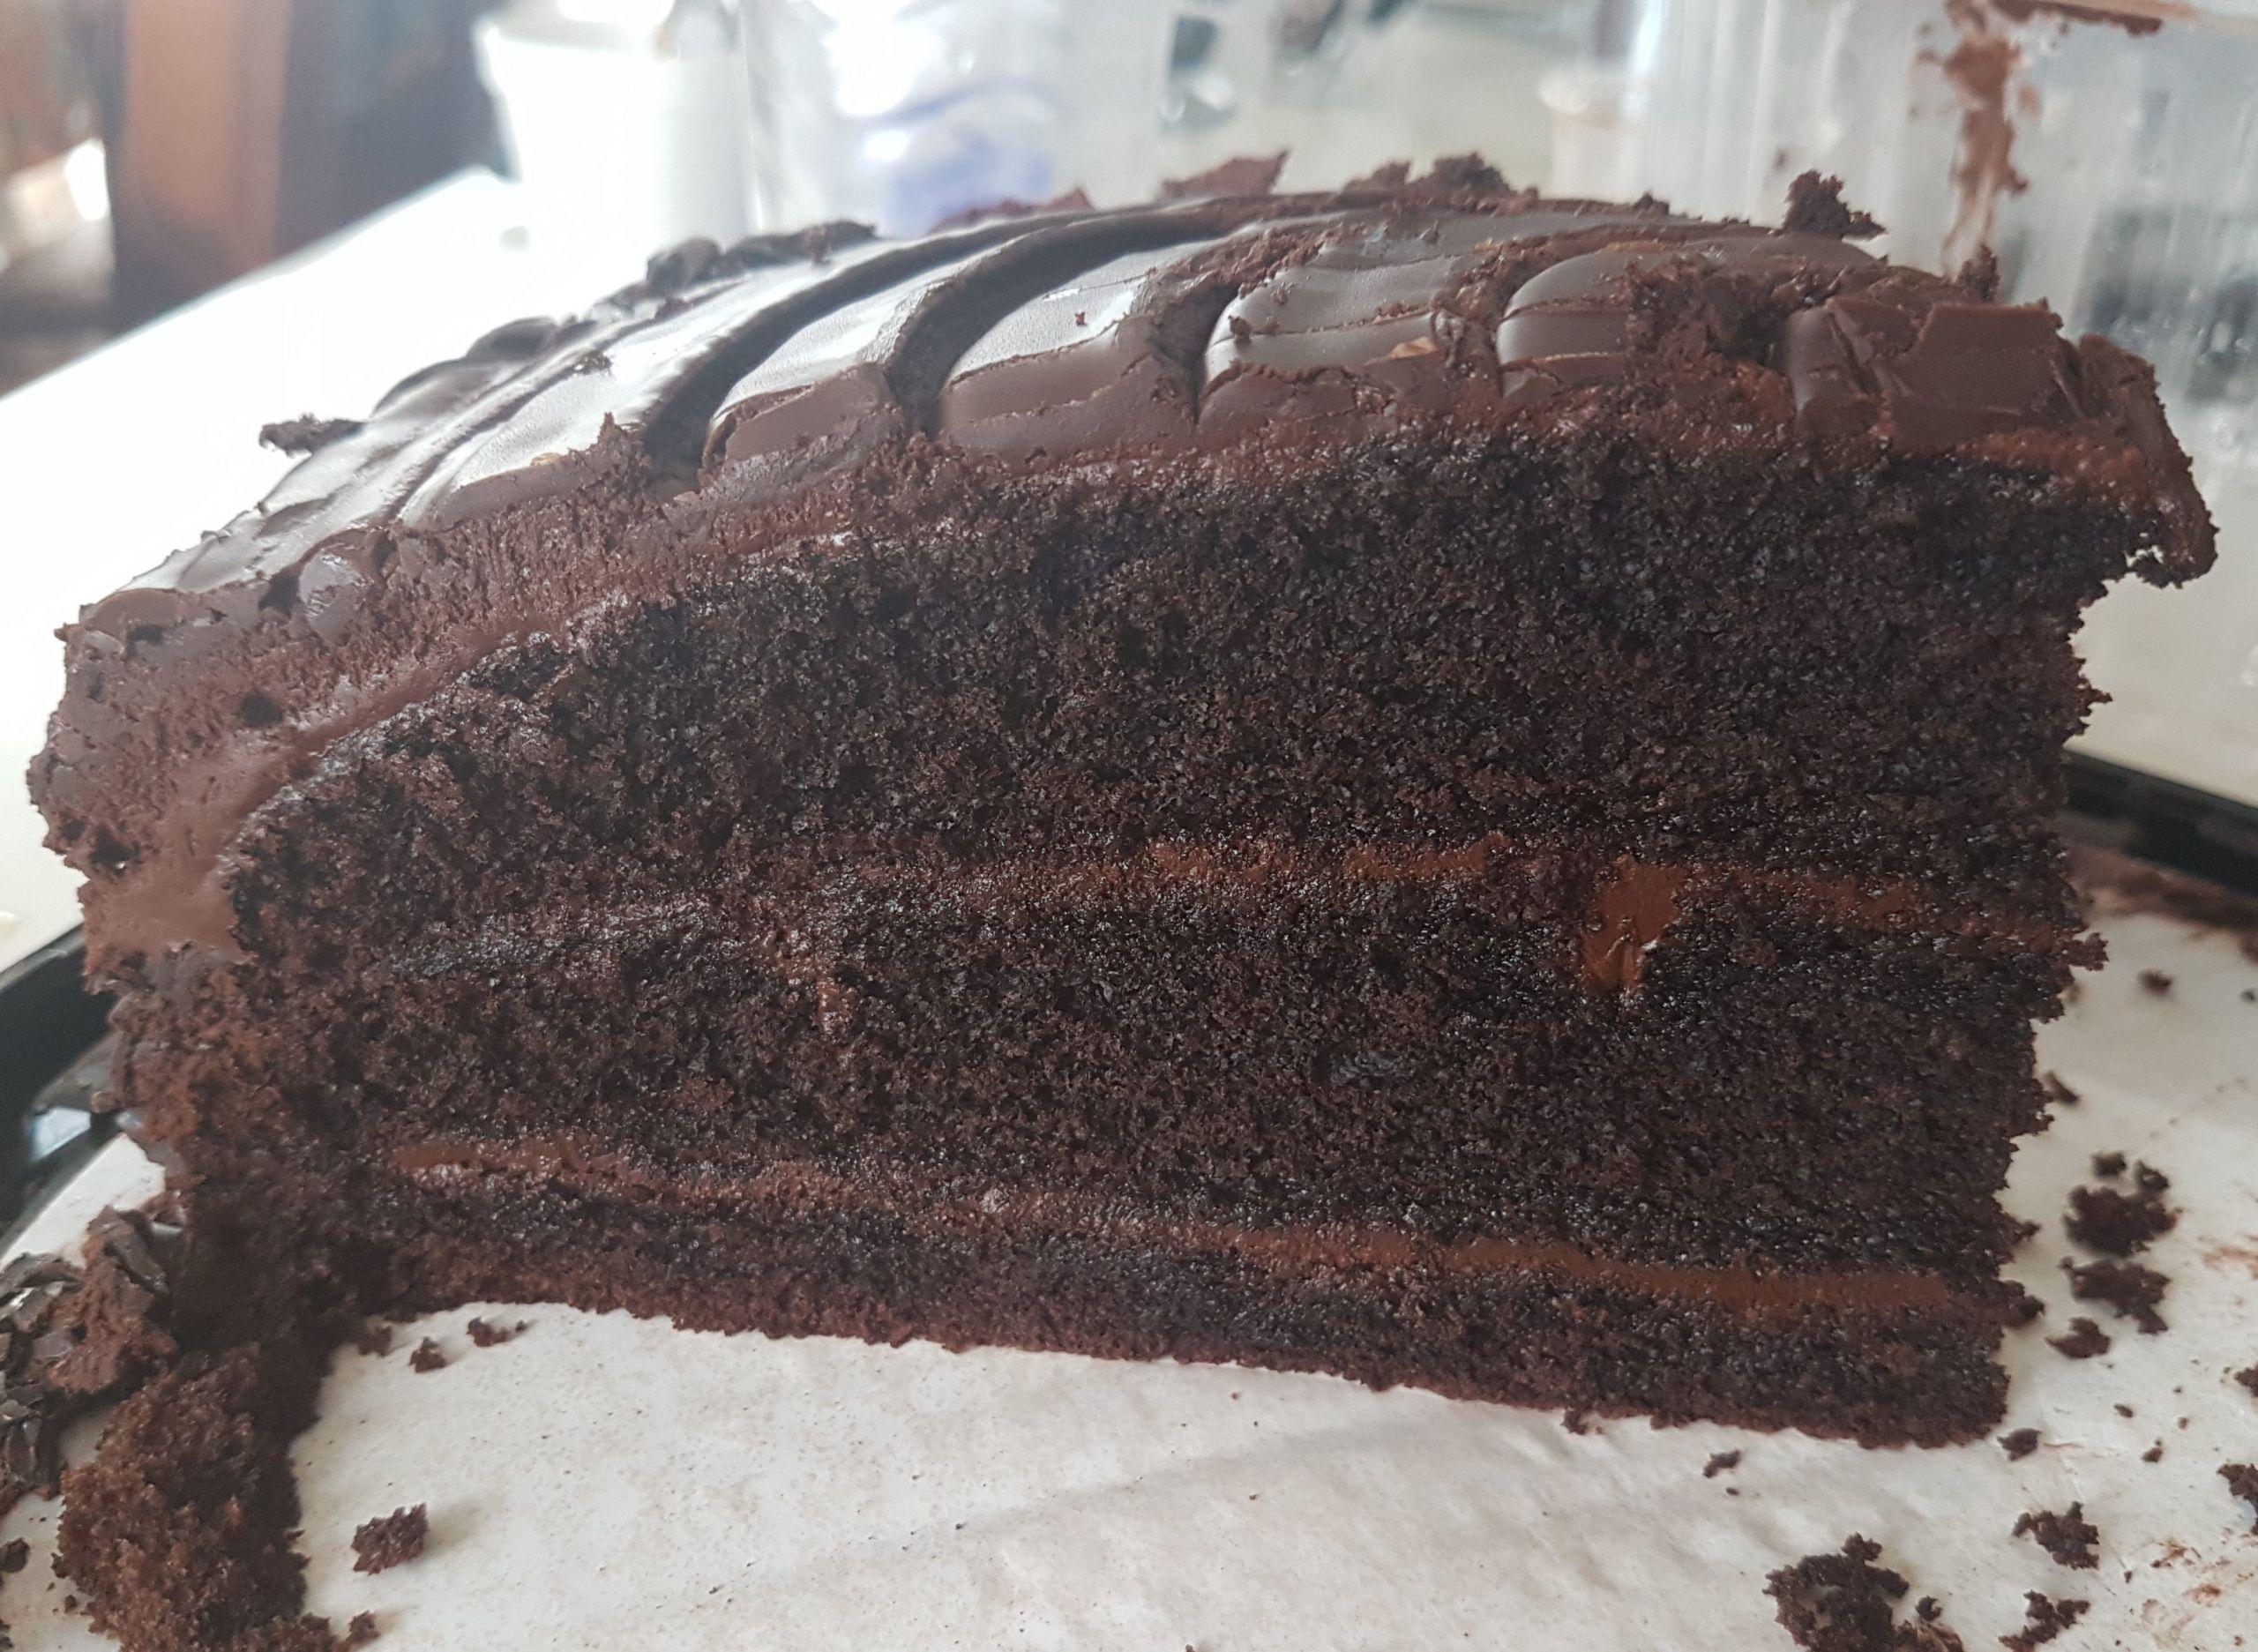 Costco Chocolate Cake  Costco s Chocolate Cake vs Carrot Cake Food Review